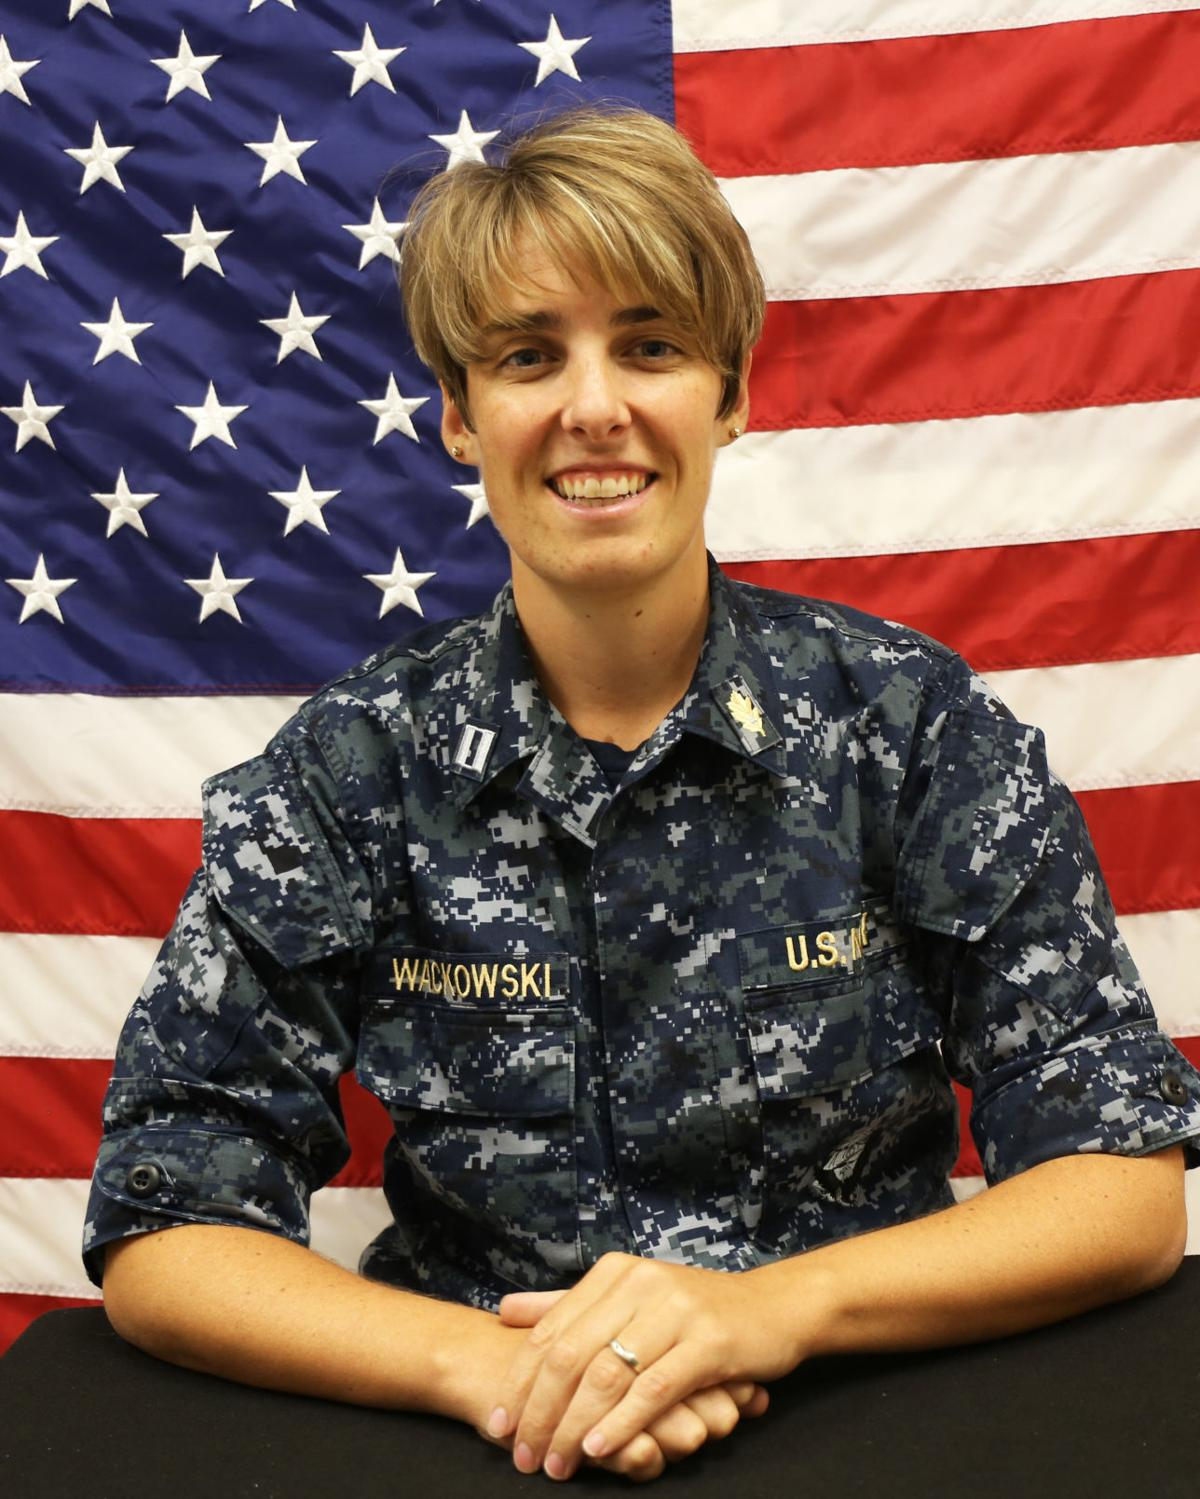 Lt. Gillian Wackowski